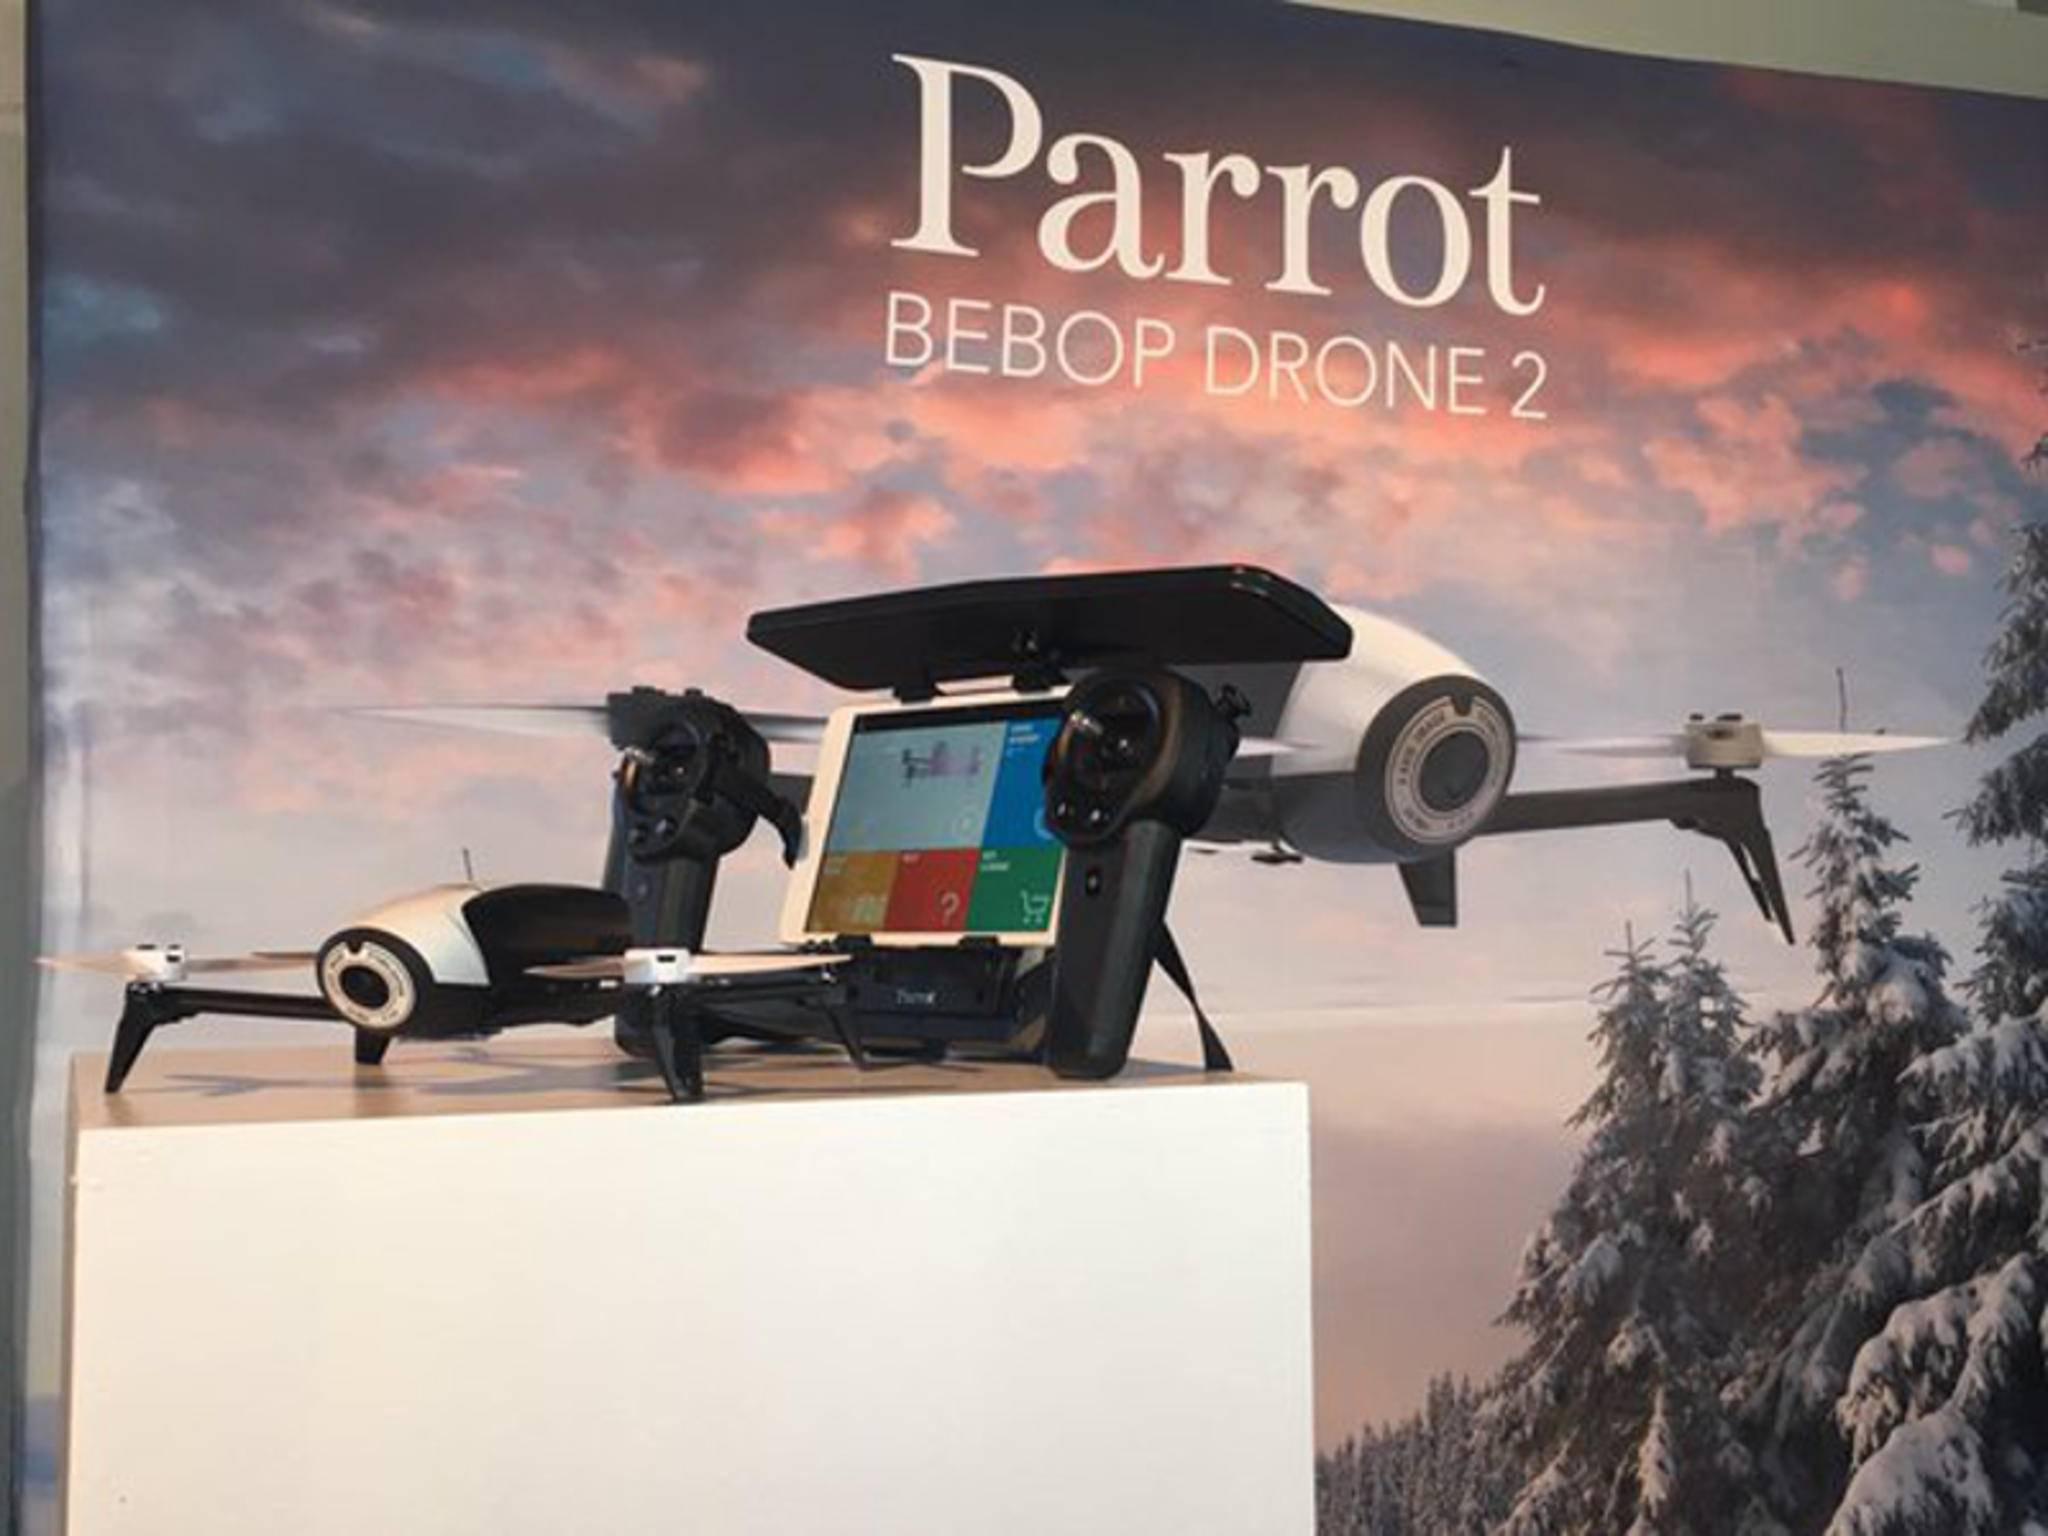 Parrot hat die Bebop 2 mit längerer Flugdauer enthüllt.